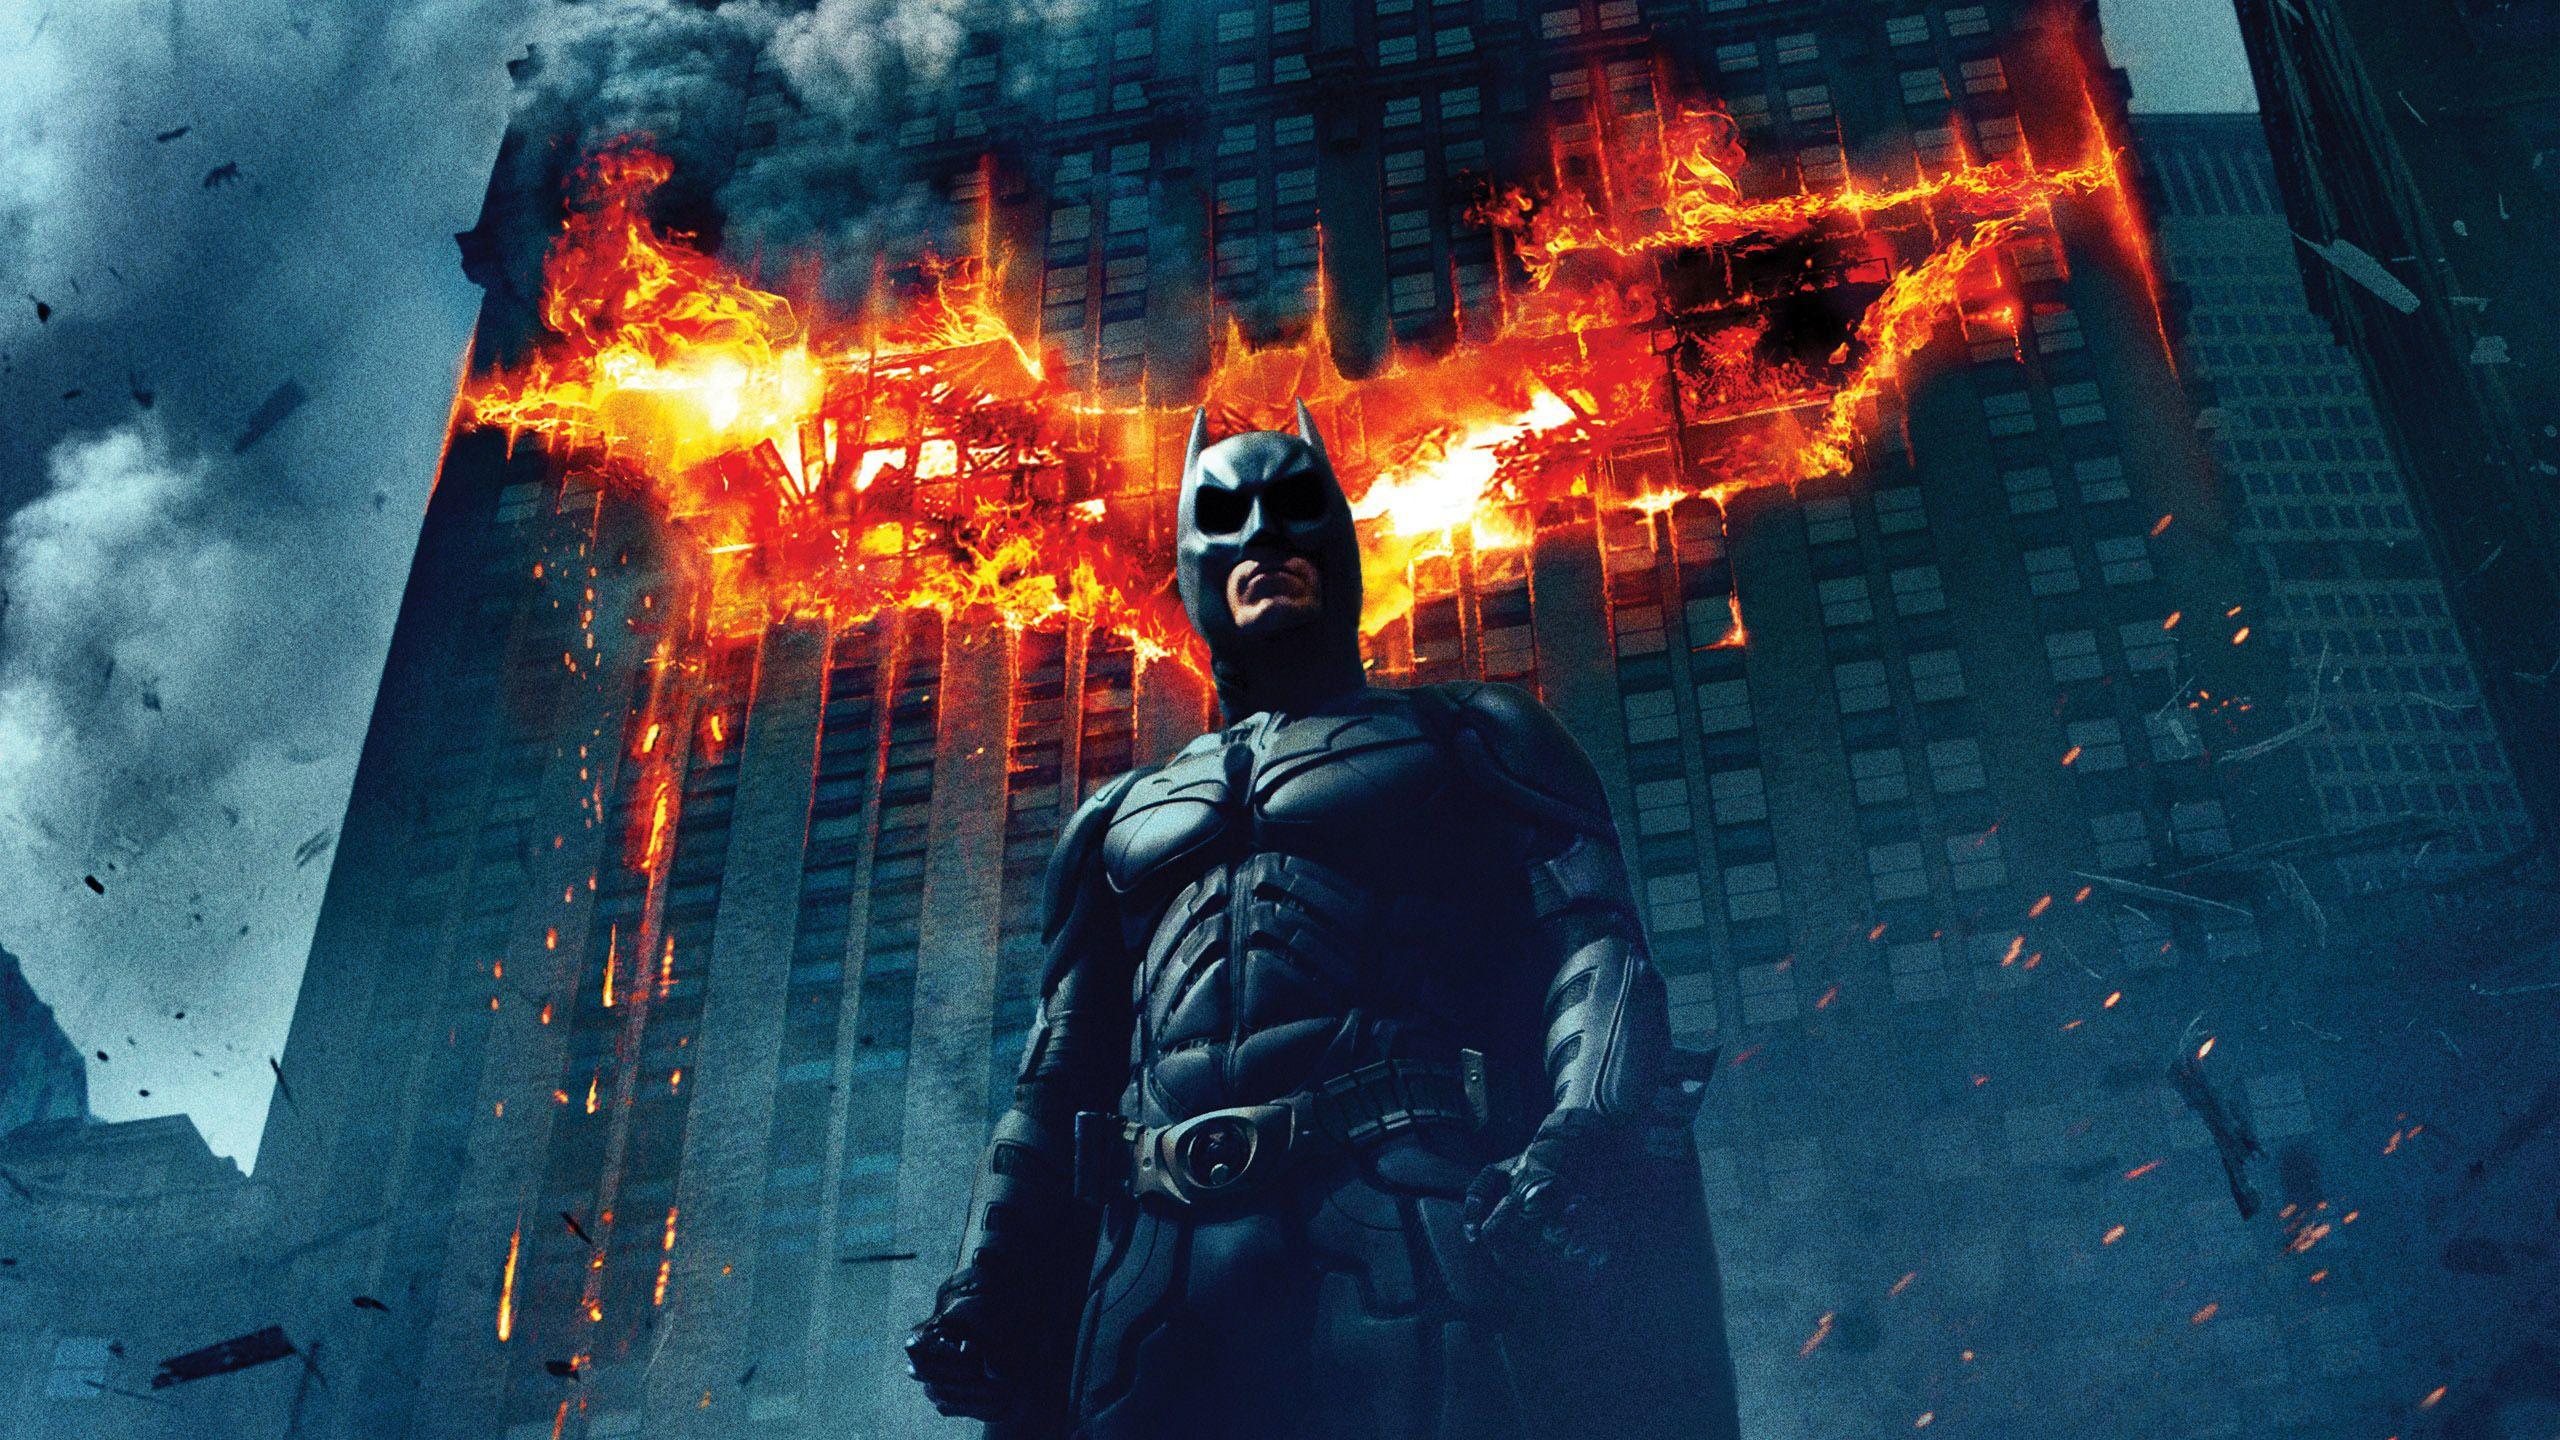 the batman wallpaper, batman backgrounds